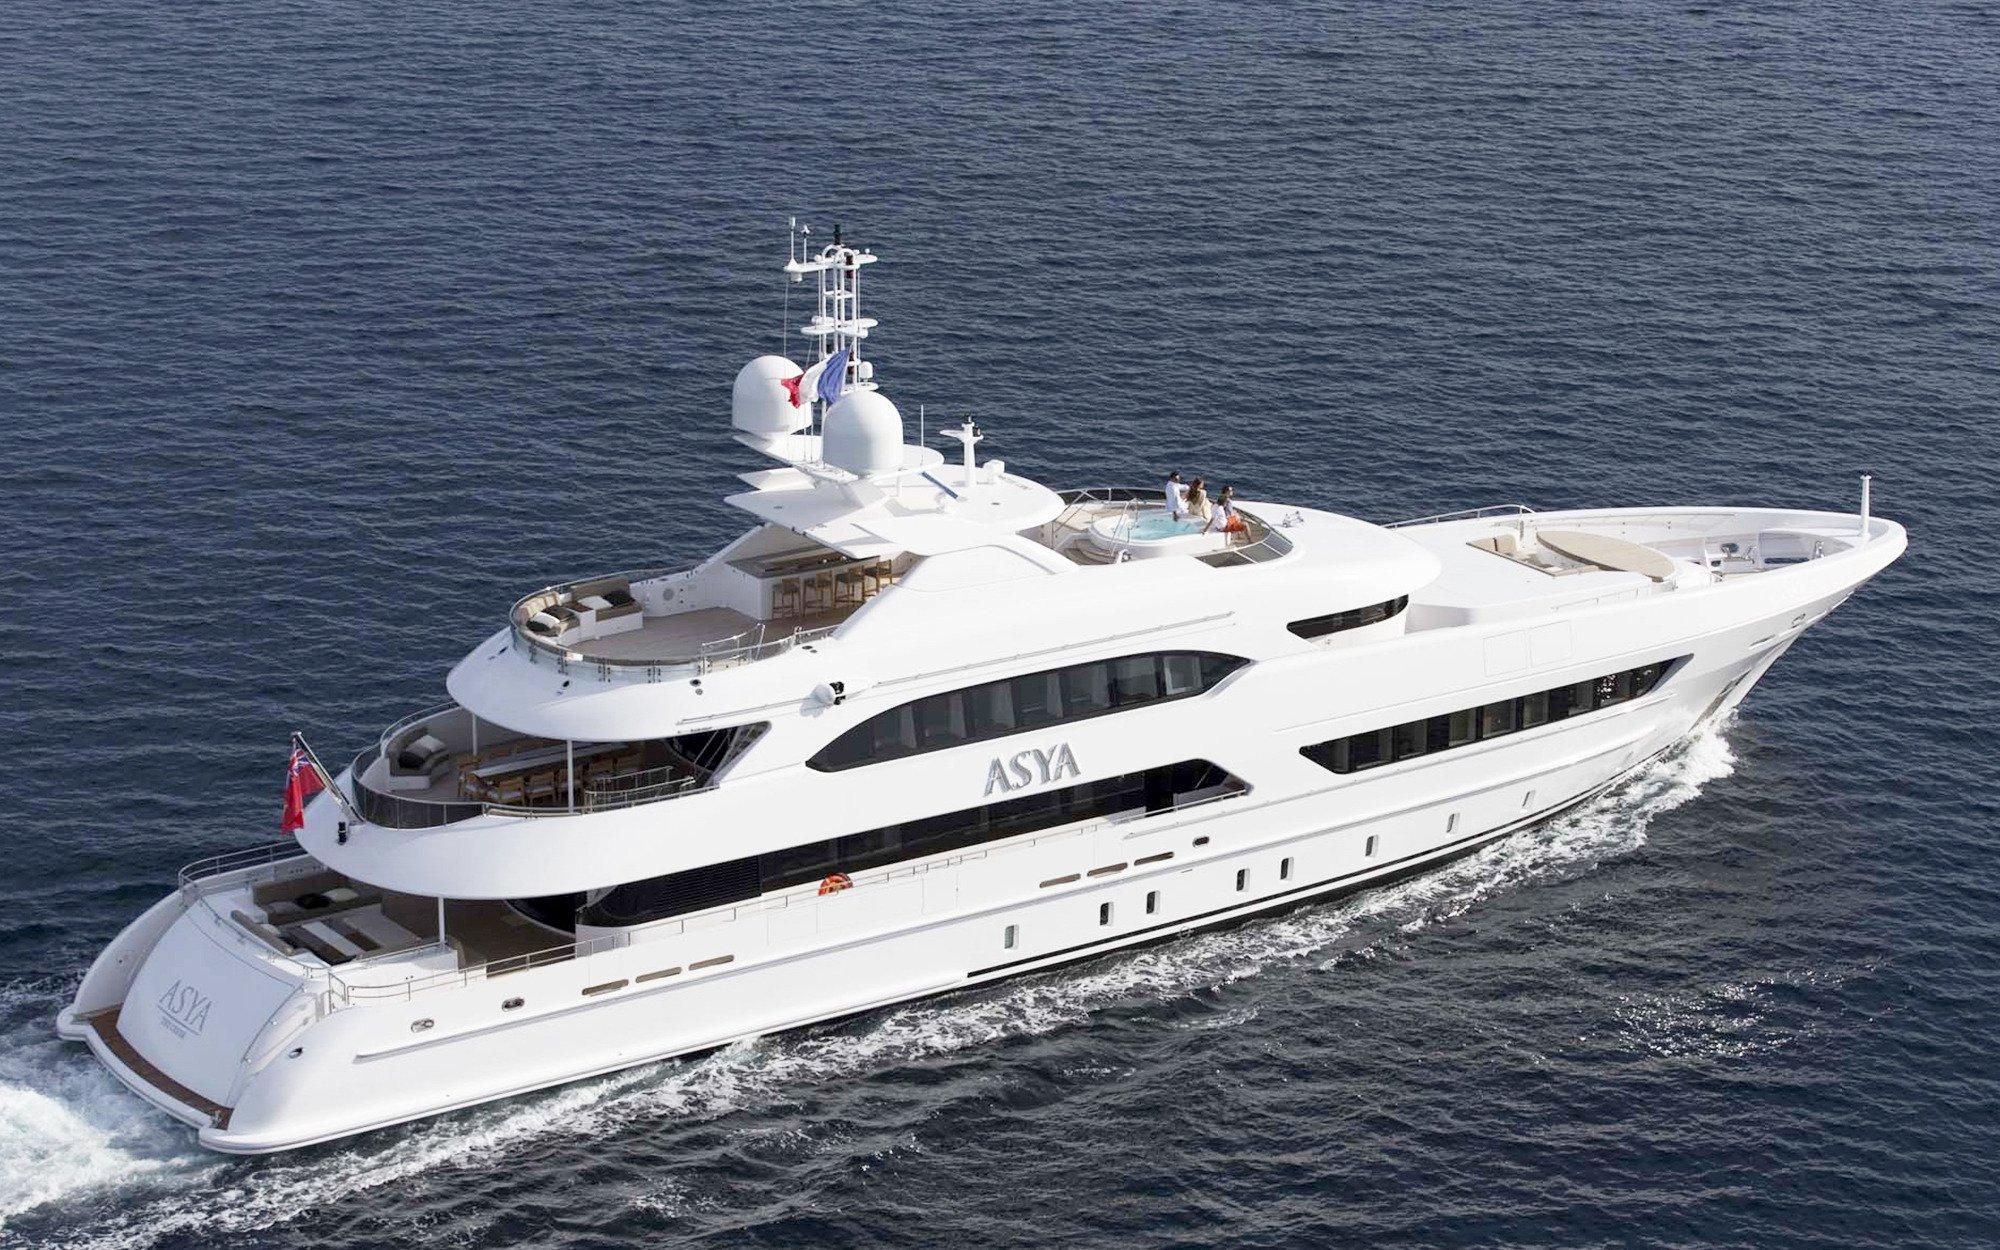 Motor Yacht ASYA for Sale with SuperYachtsMonaco